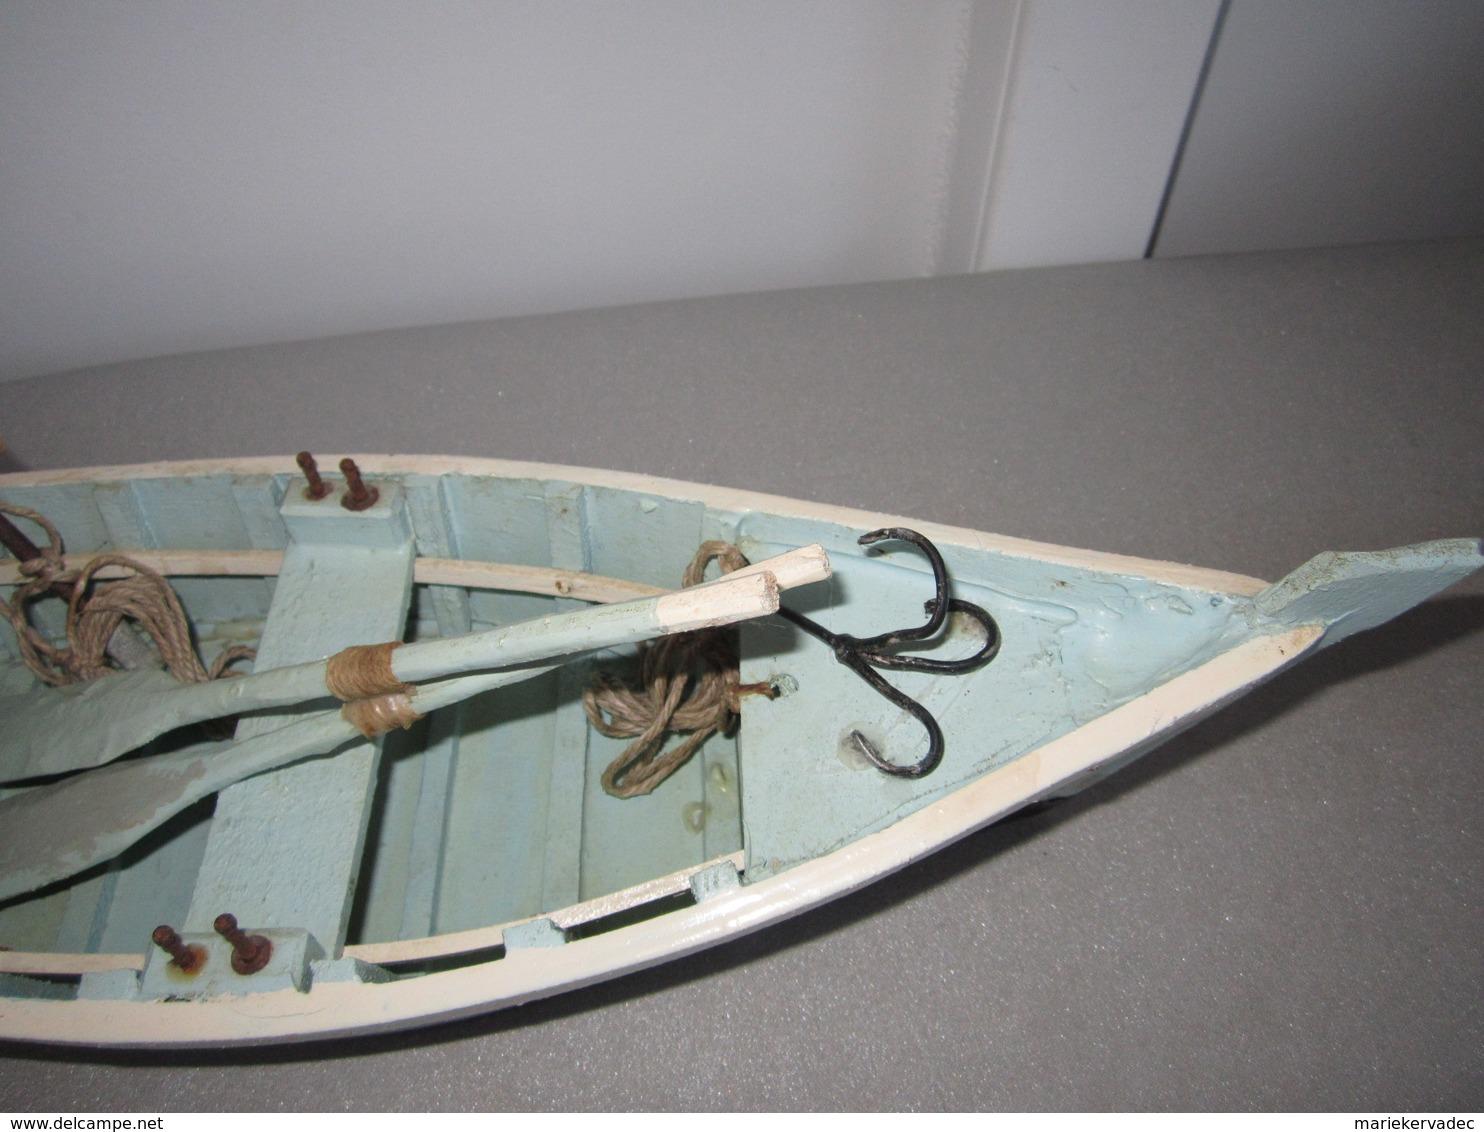 Plate Du Golfe Du Morbihan FAITE MAIN - Bâteaux